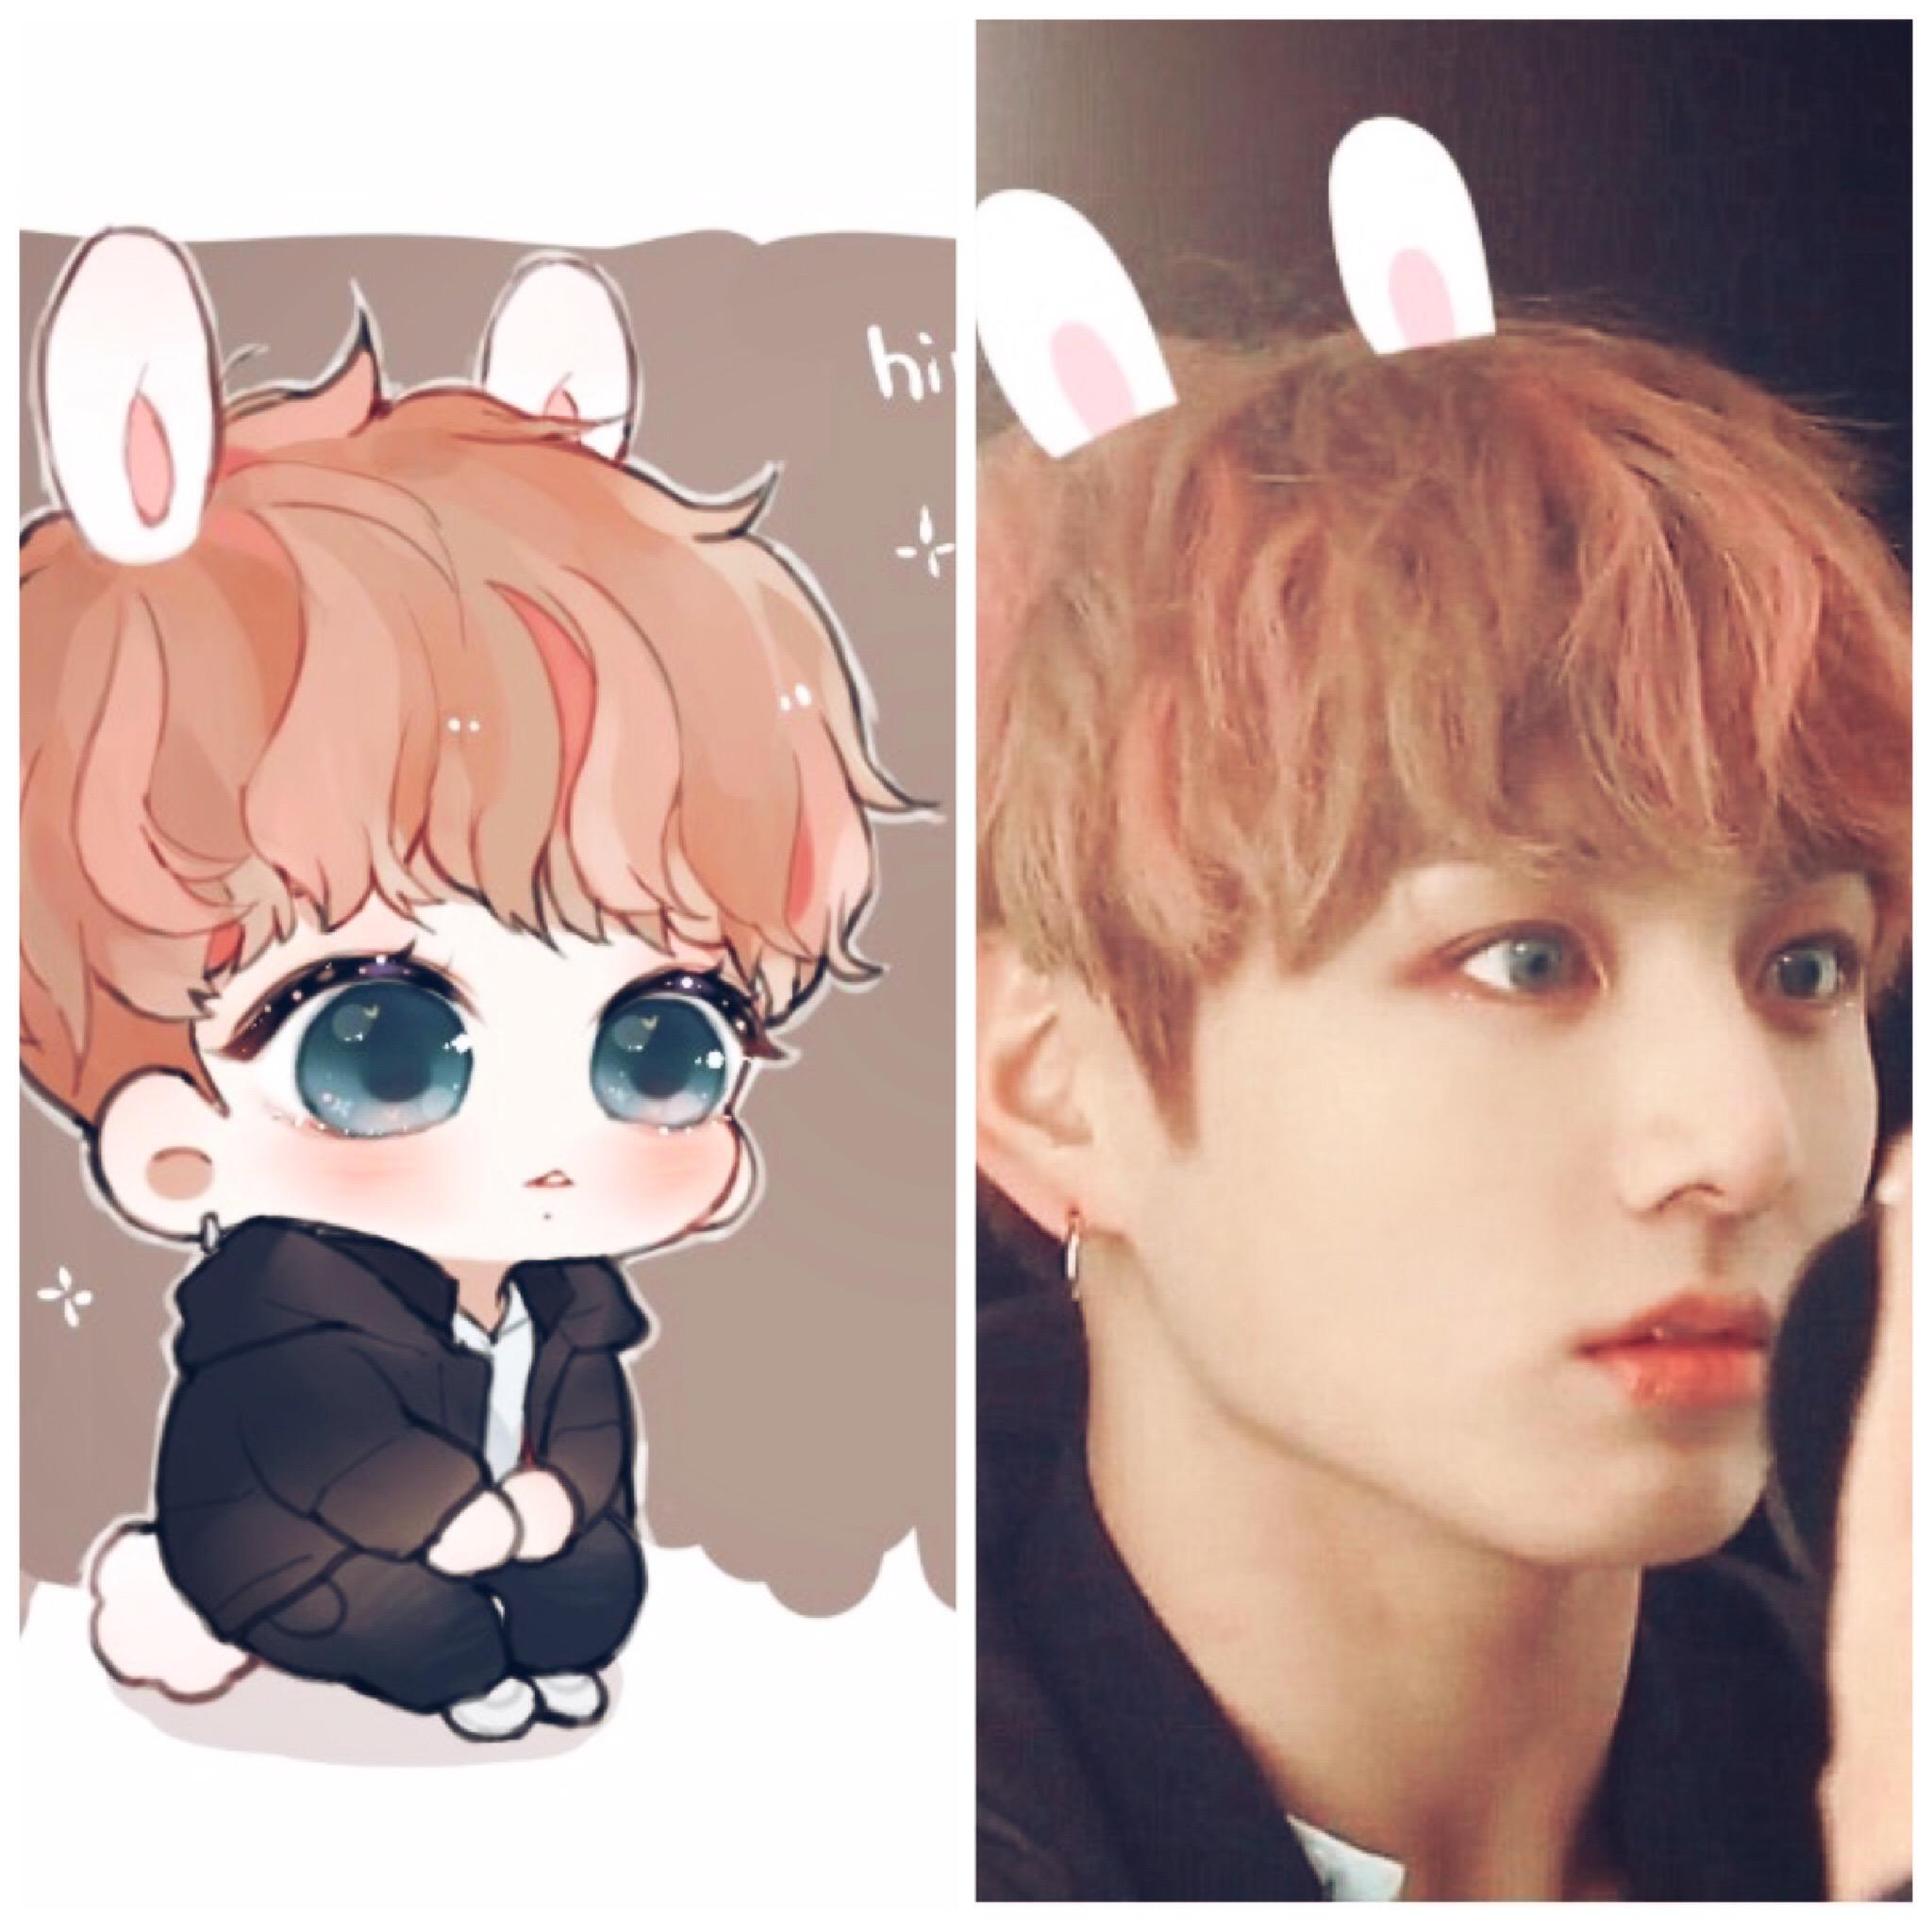 bts bangtanboys jungkookie kookie jungkook kawaii cute cute love couple clipart Love Clip Art